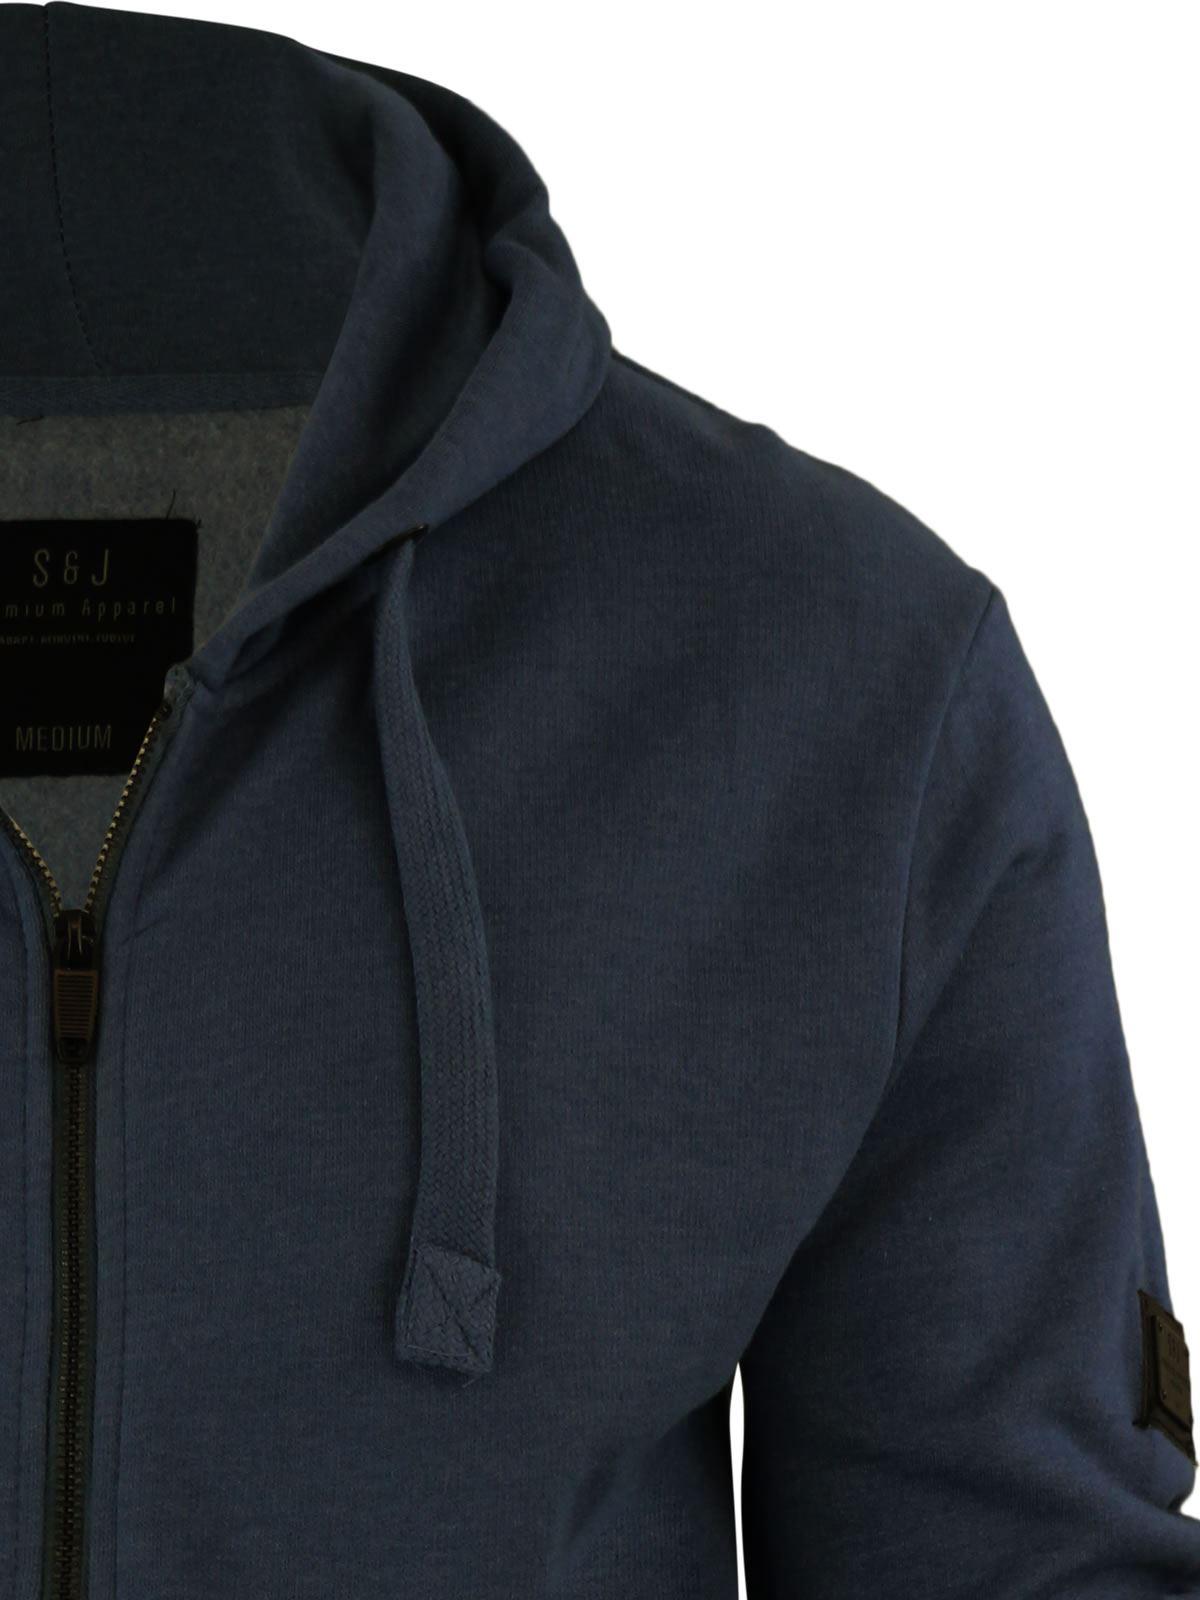 Mens-Hoodie-Smith-amp-Jones-Zip-Up-Hooded-Sweater-Jumper thumbnail 34